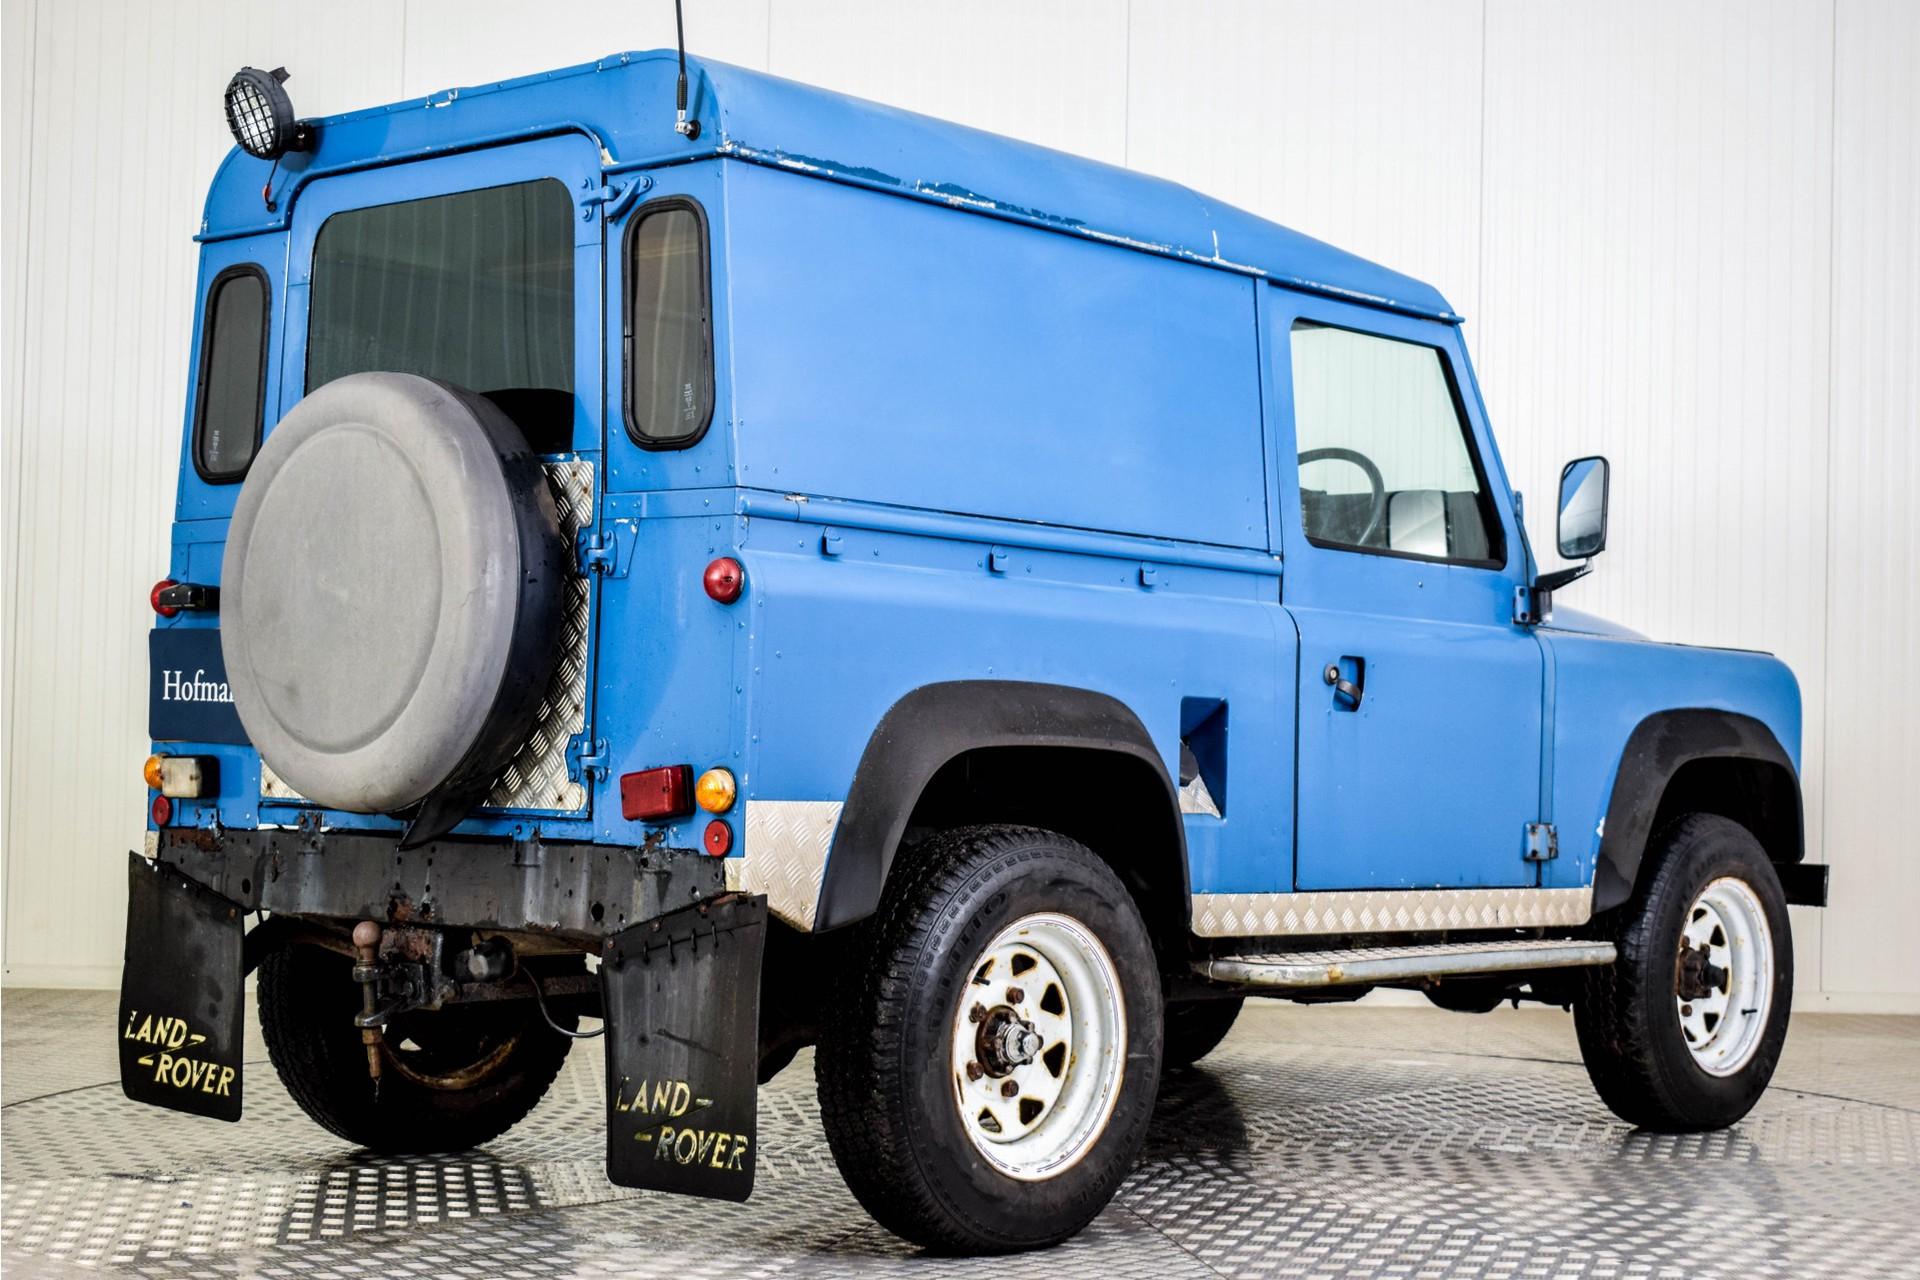 Land Rover Defender 90 2.5 TDI Foto 2